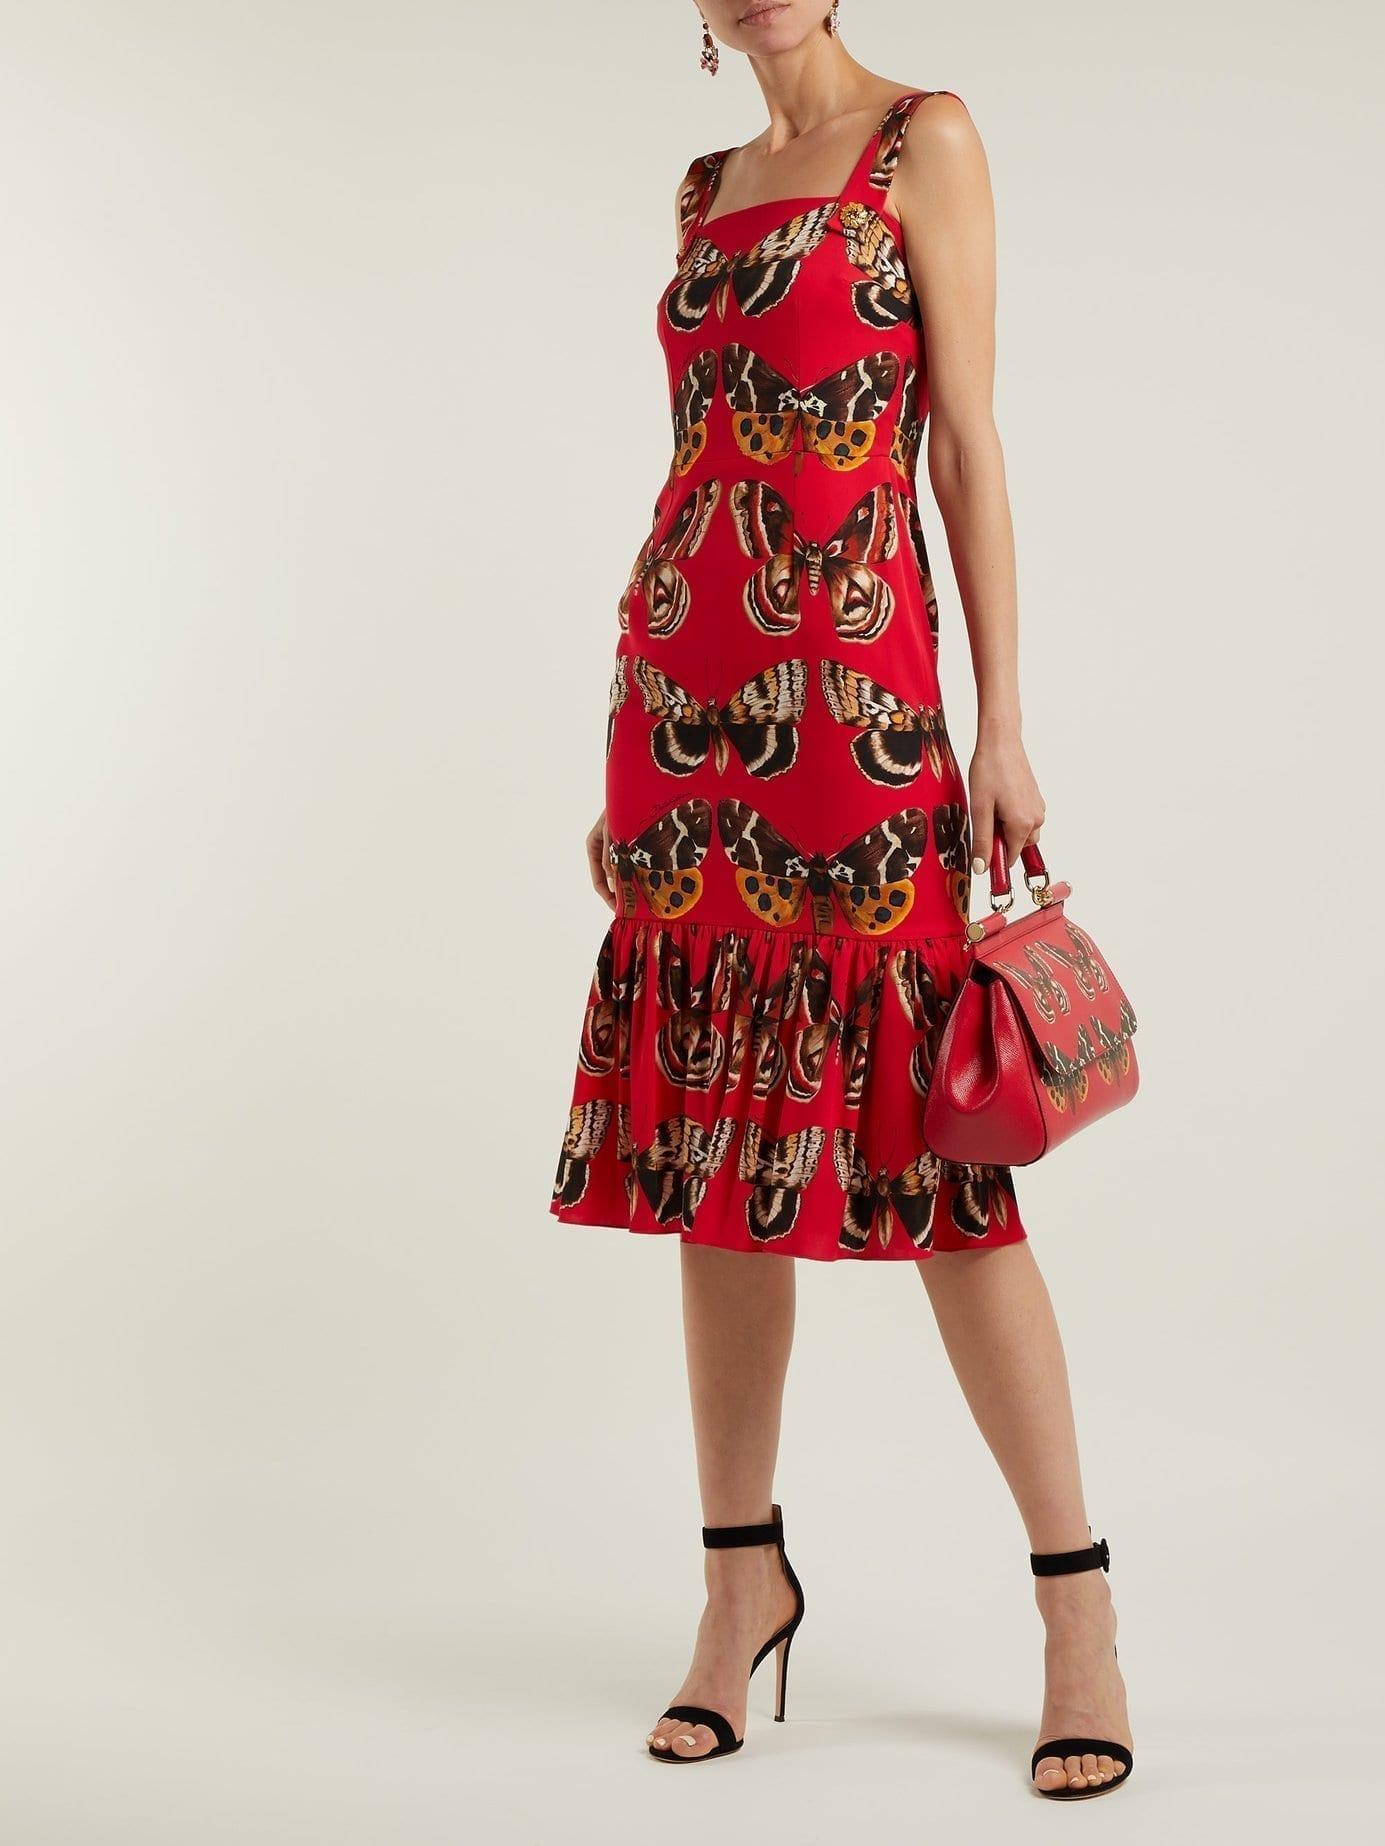 9553d3575af DOLCE   GABBANA Butterfly Print Silk Blend Midi Red Dress - We ...